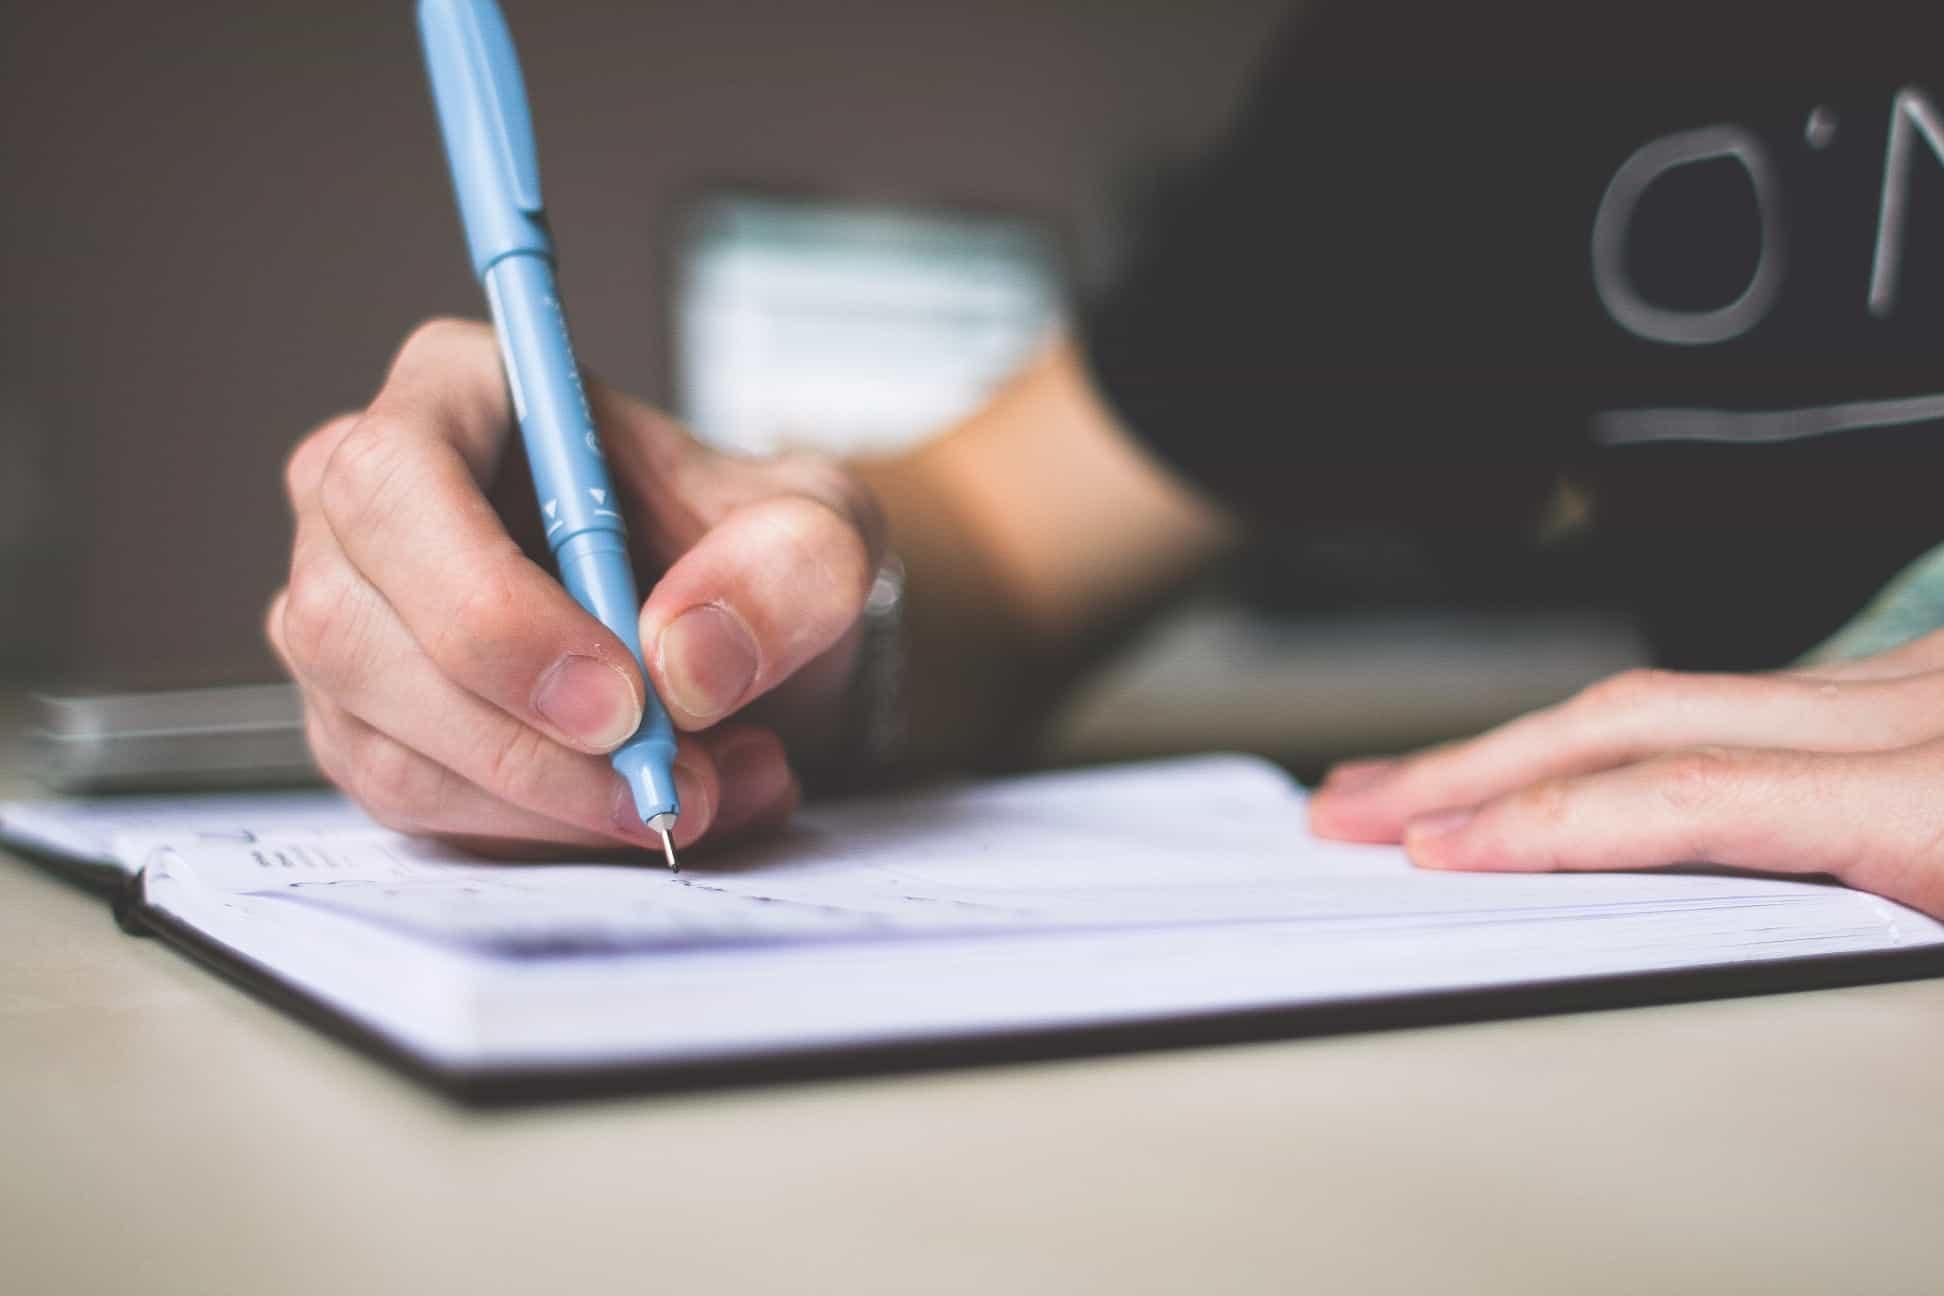 Practice The Art Of Grateful Writing